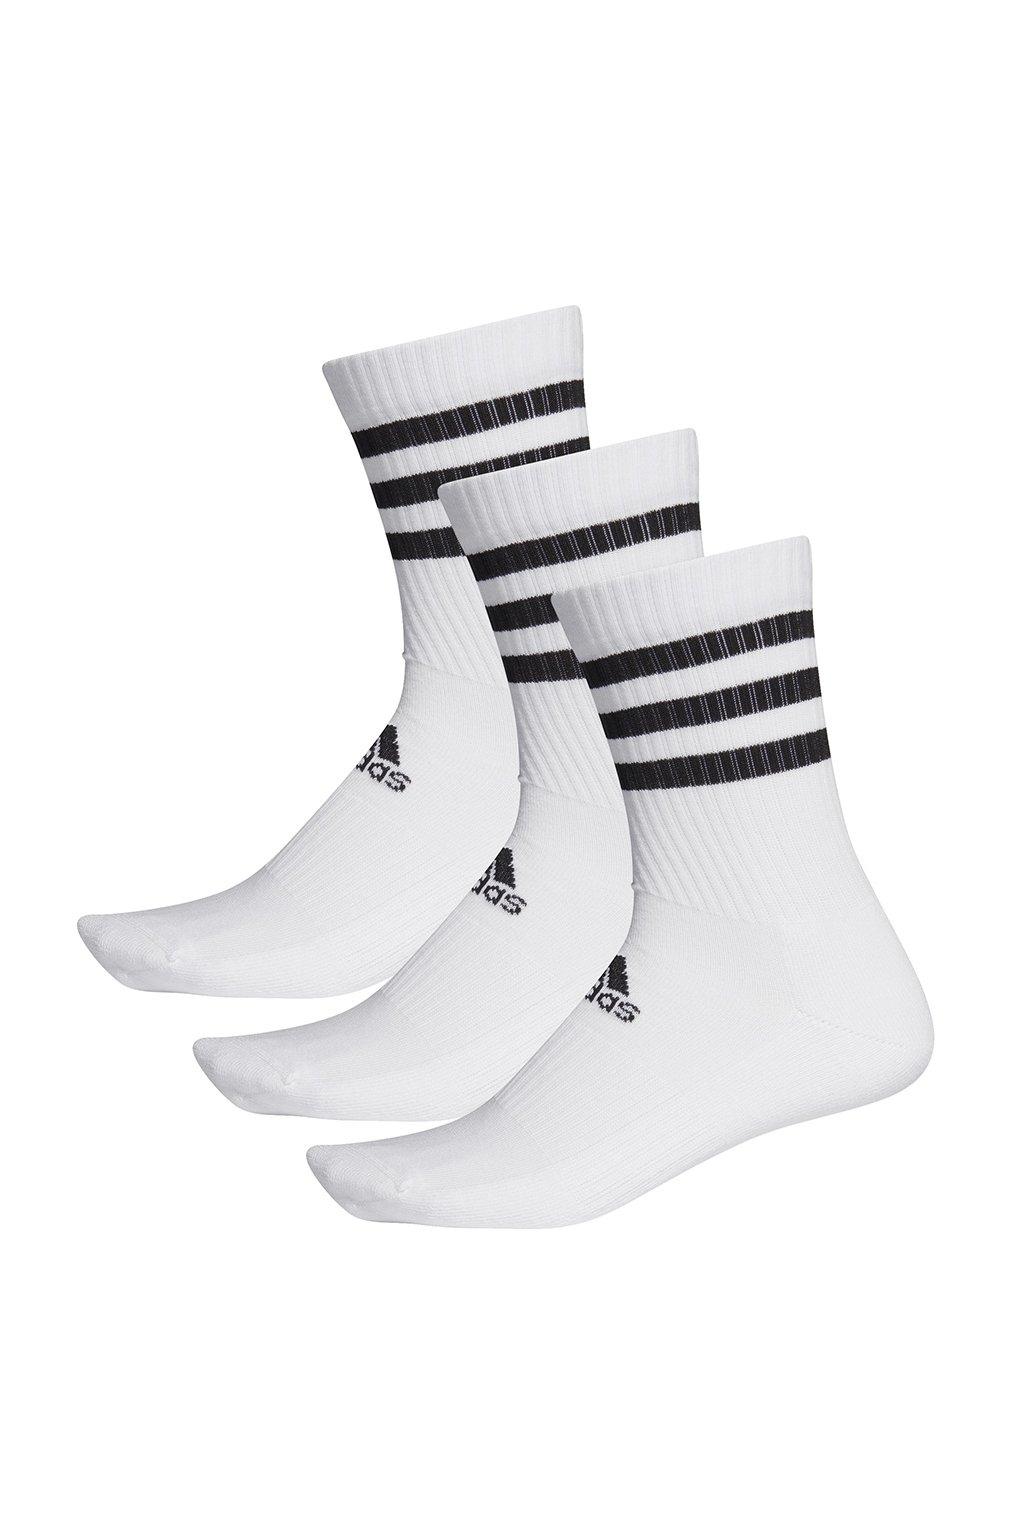 Adidas ponožky 3S CSH CRW 3páry DZ9346